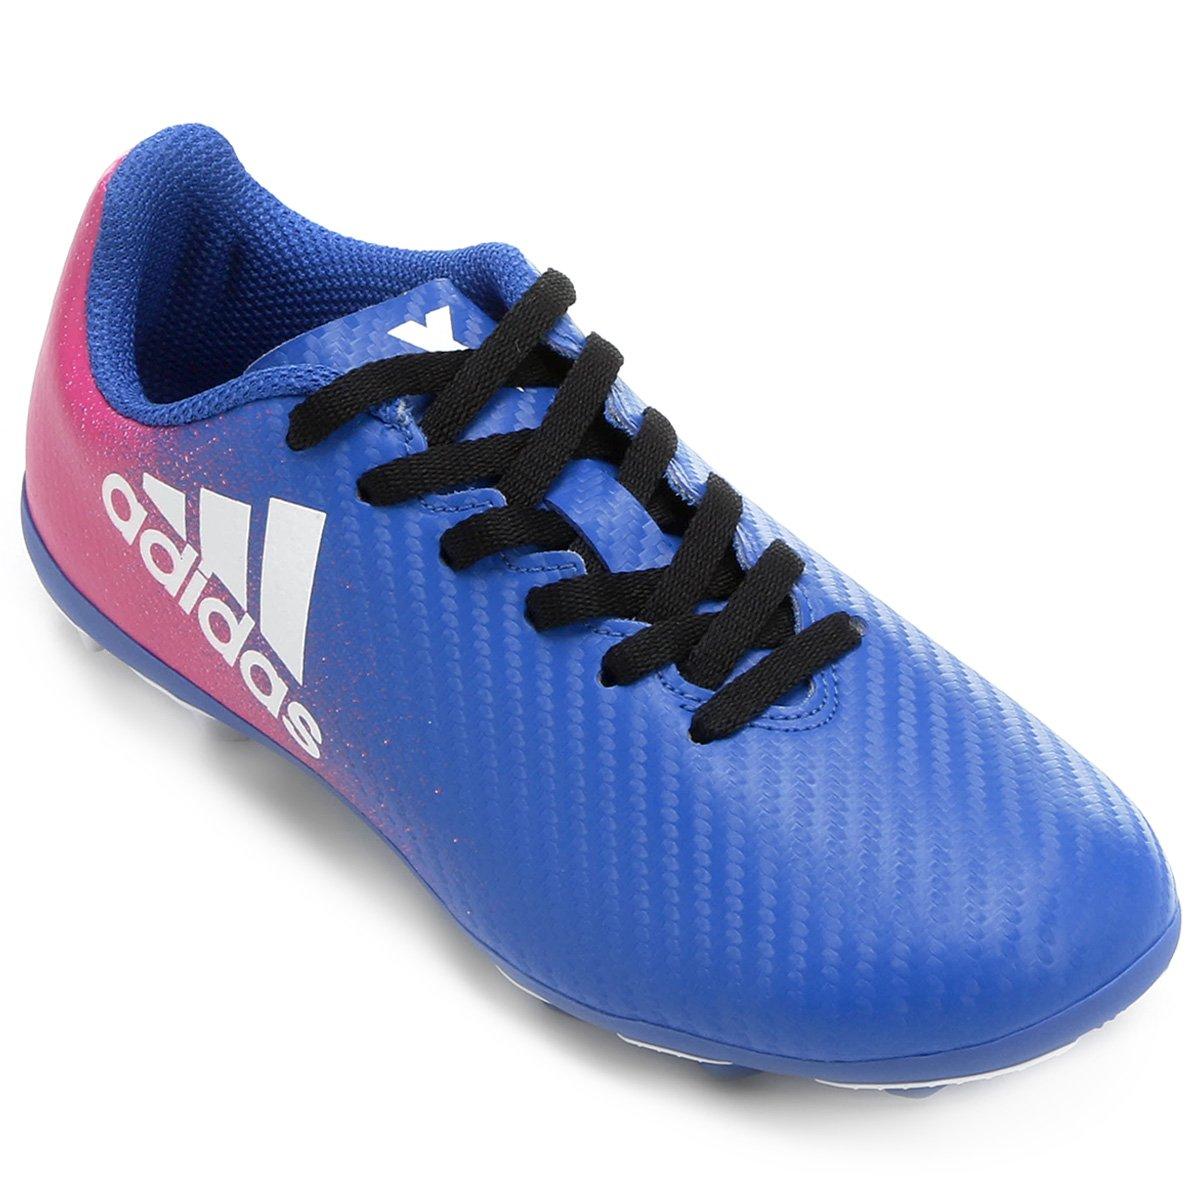 5cc847f14f Chuteira Campo Juvenil Adidas X 16 4 FXG - Azul e Pink